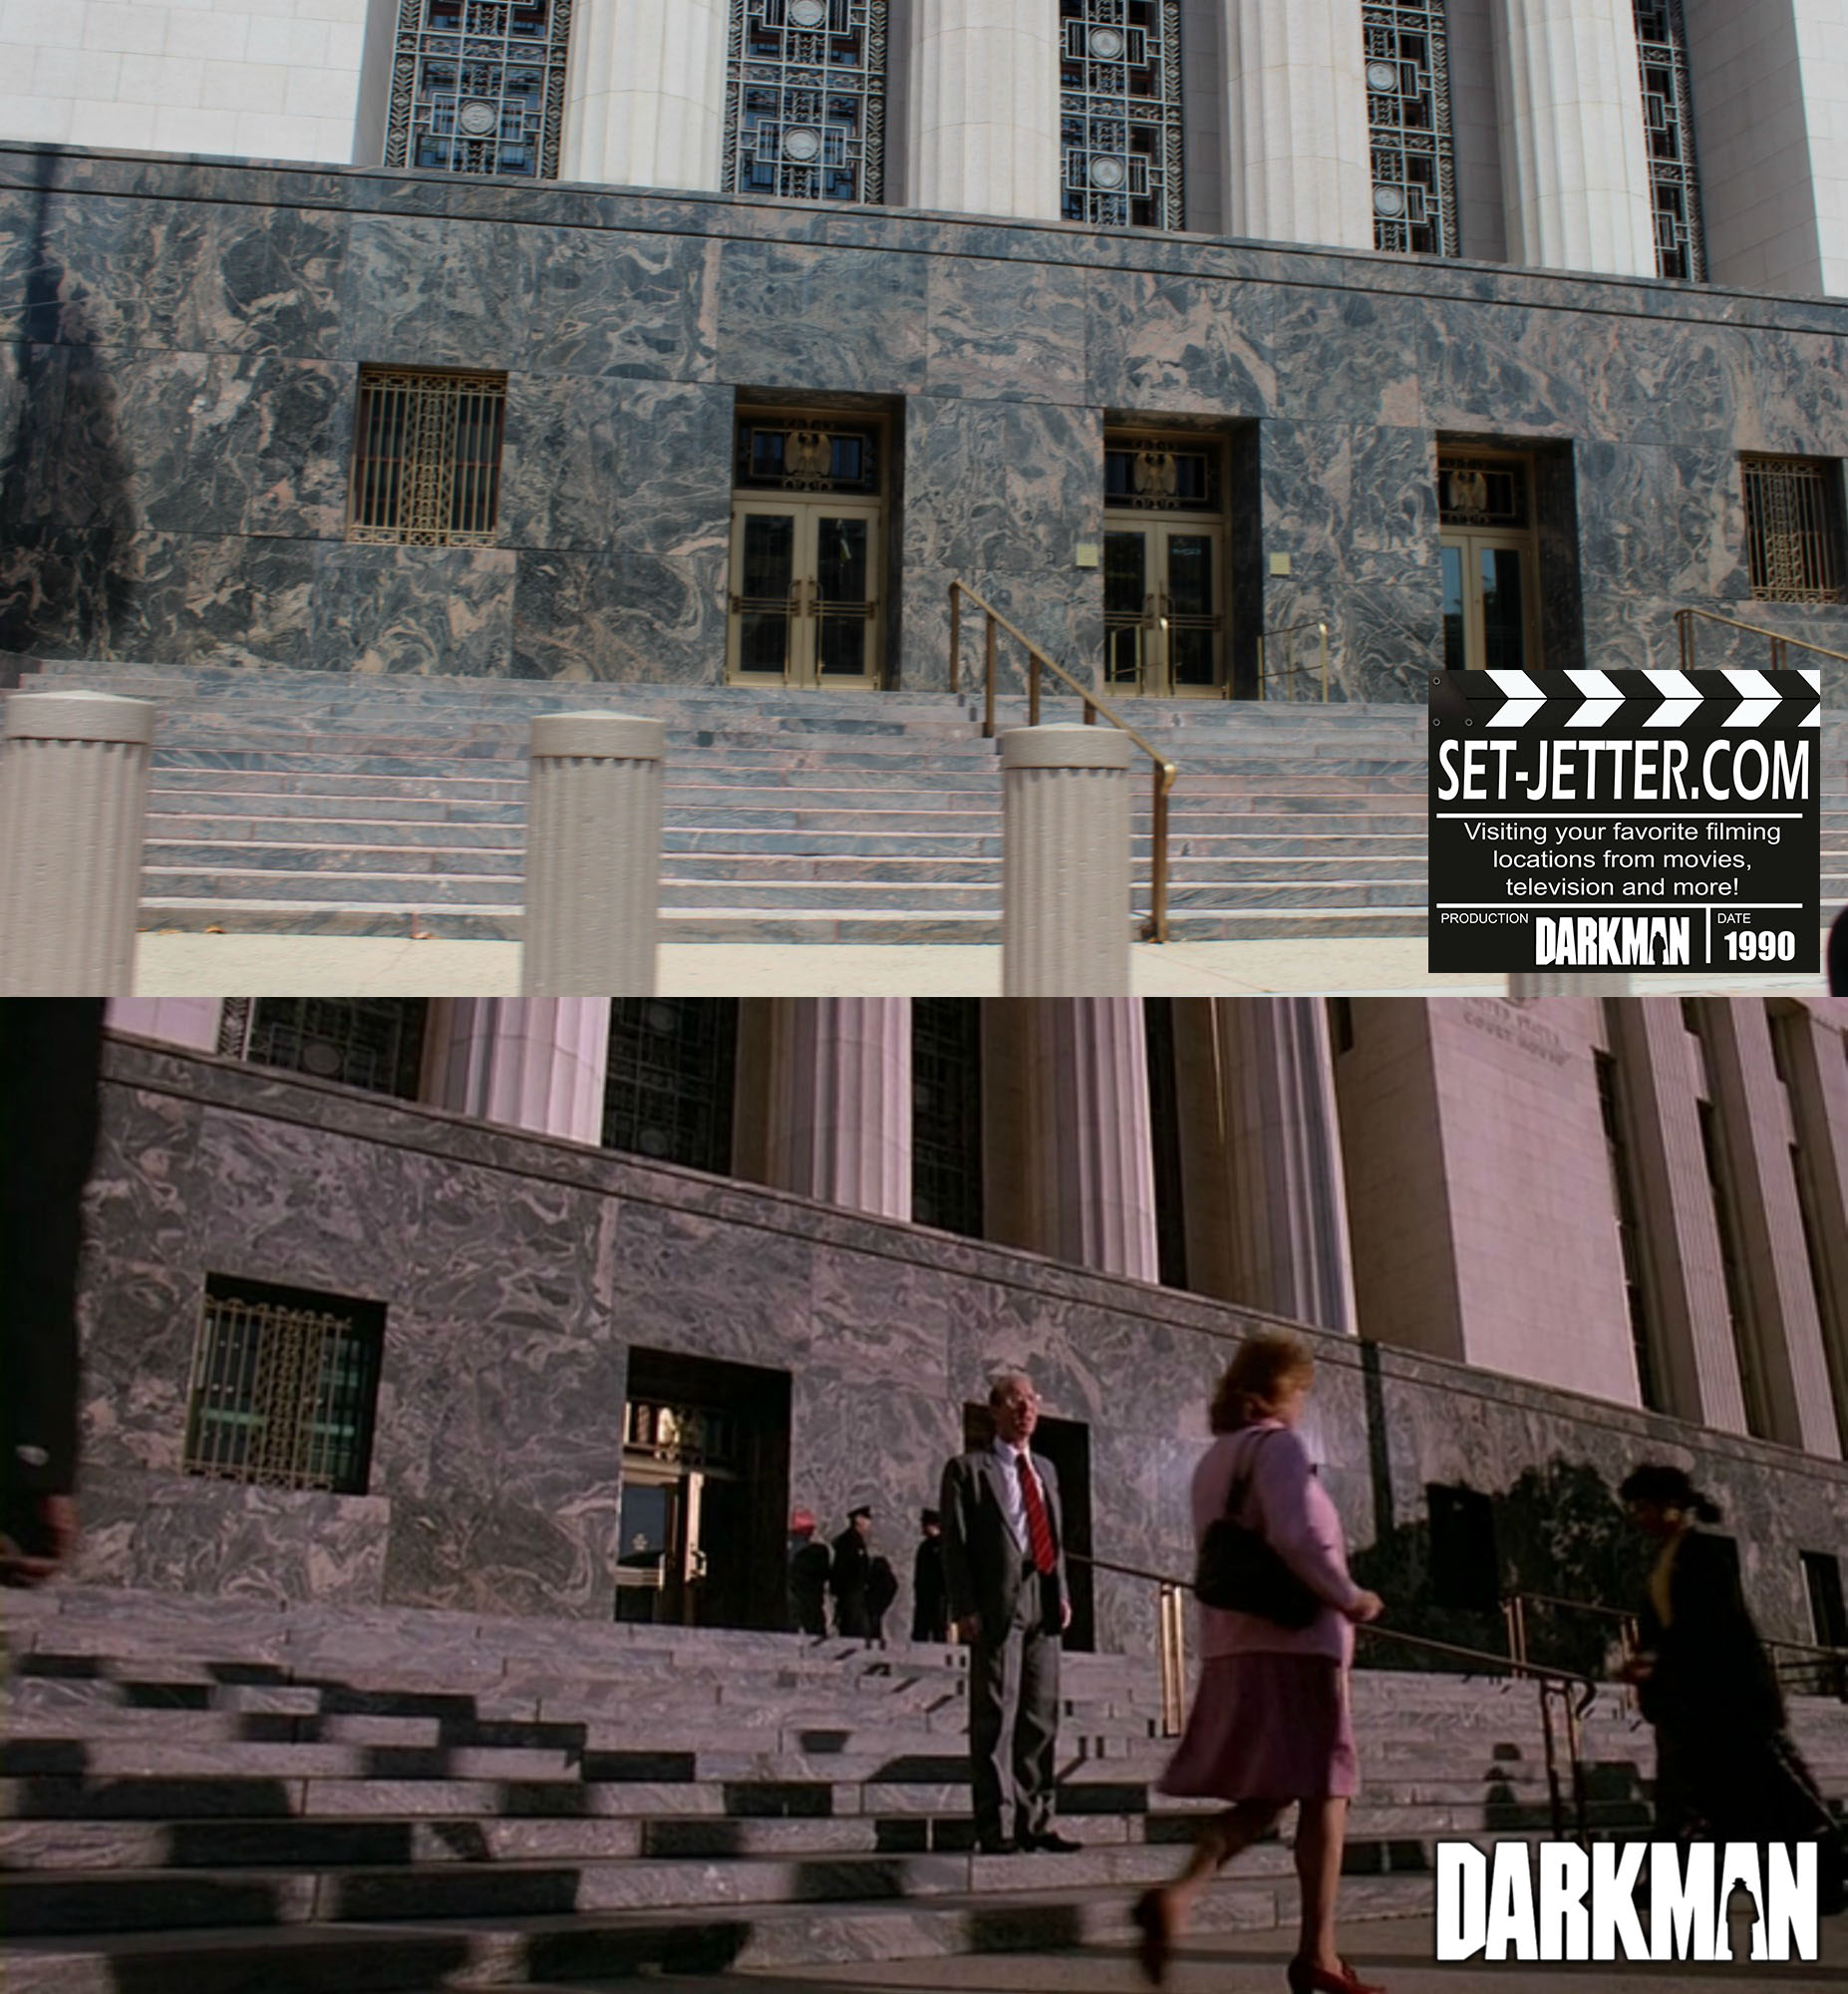 Darkman 24.jpg